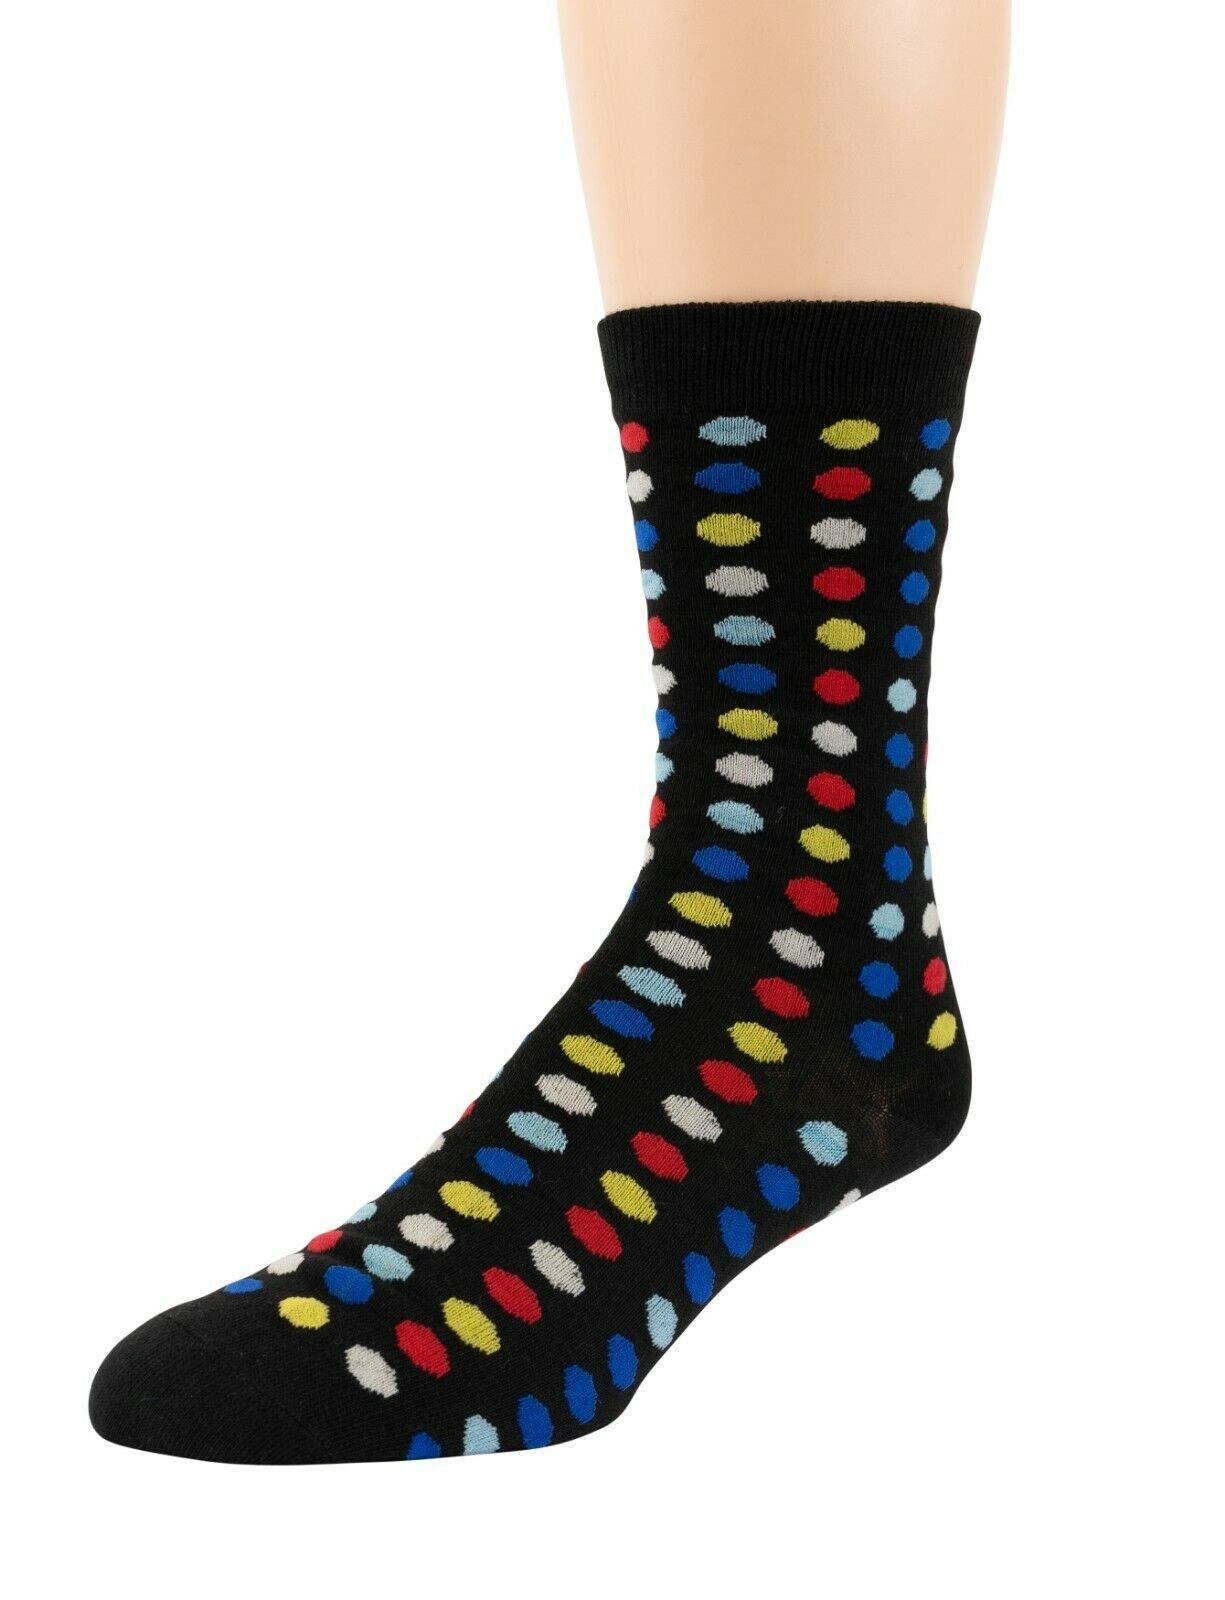 Mitch-Bogen-Mens-Cotton-Dress-Socks-Colorful-Fashion-Crew-Socks-8-Pack-Gift-Box thumbnail 64